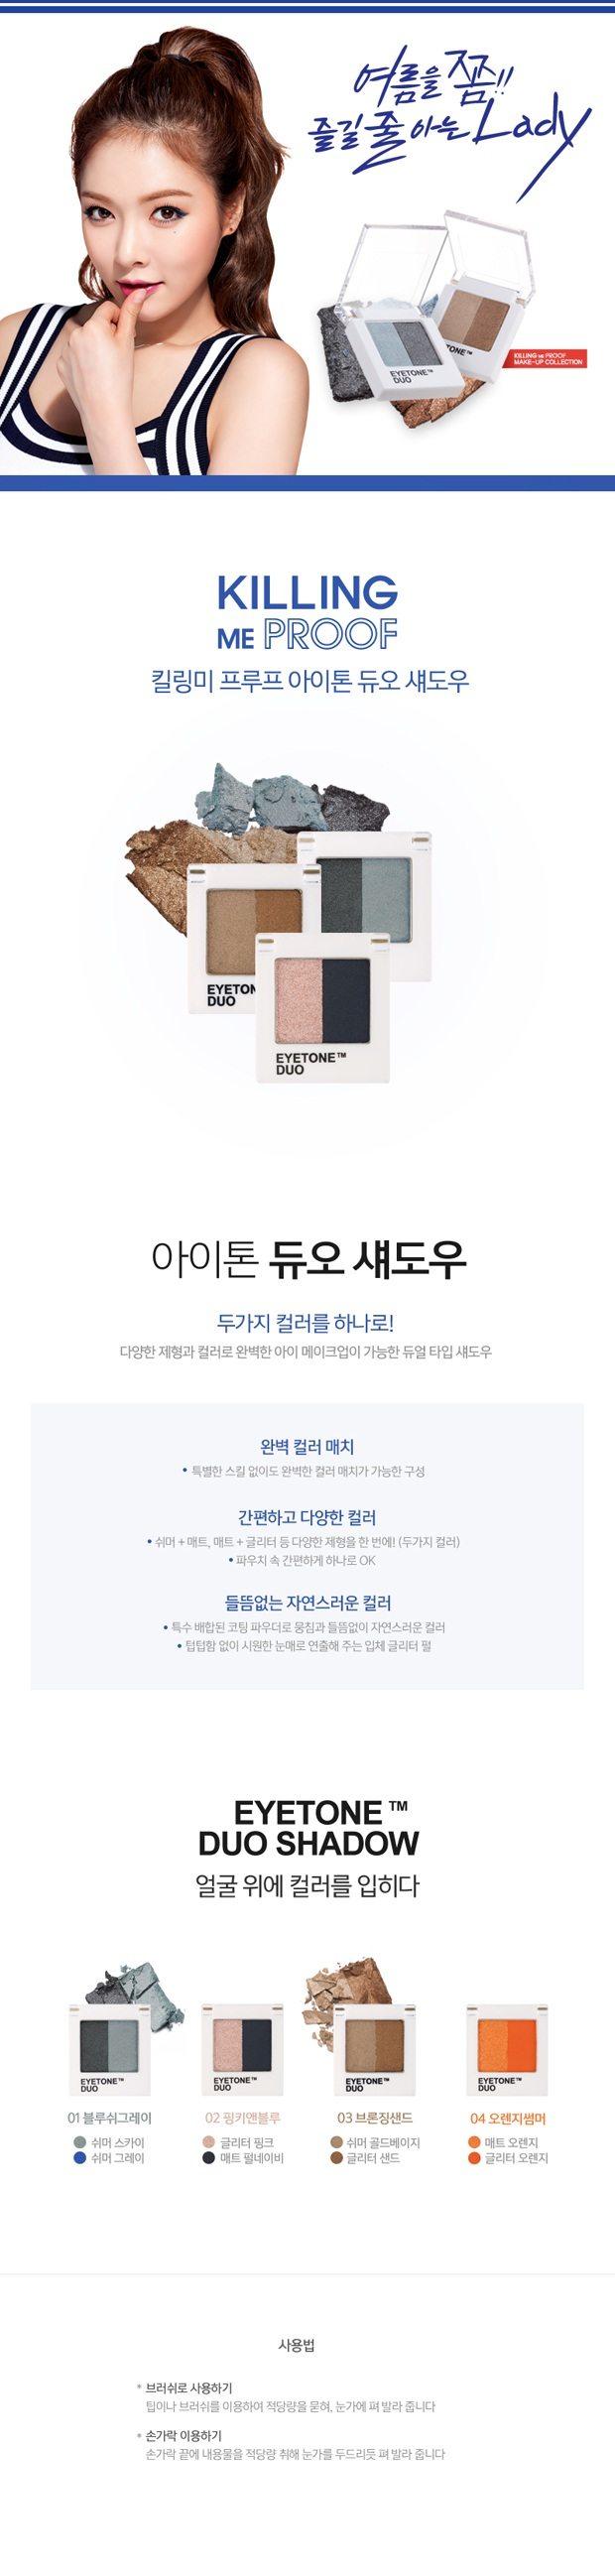 Tony Moly Eyetone Duo Shadow korean cosmetic makeup product online shop malaysia spain portugal1